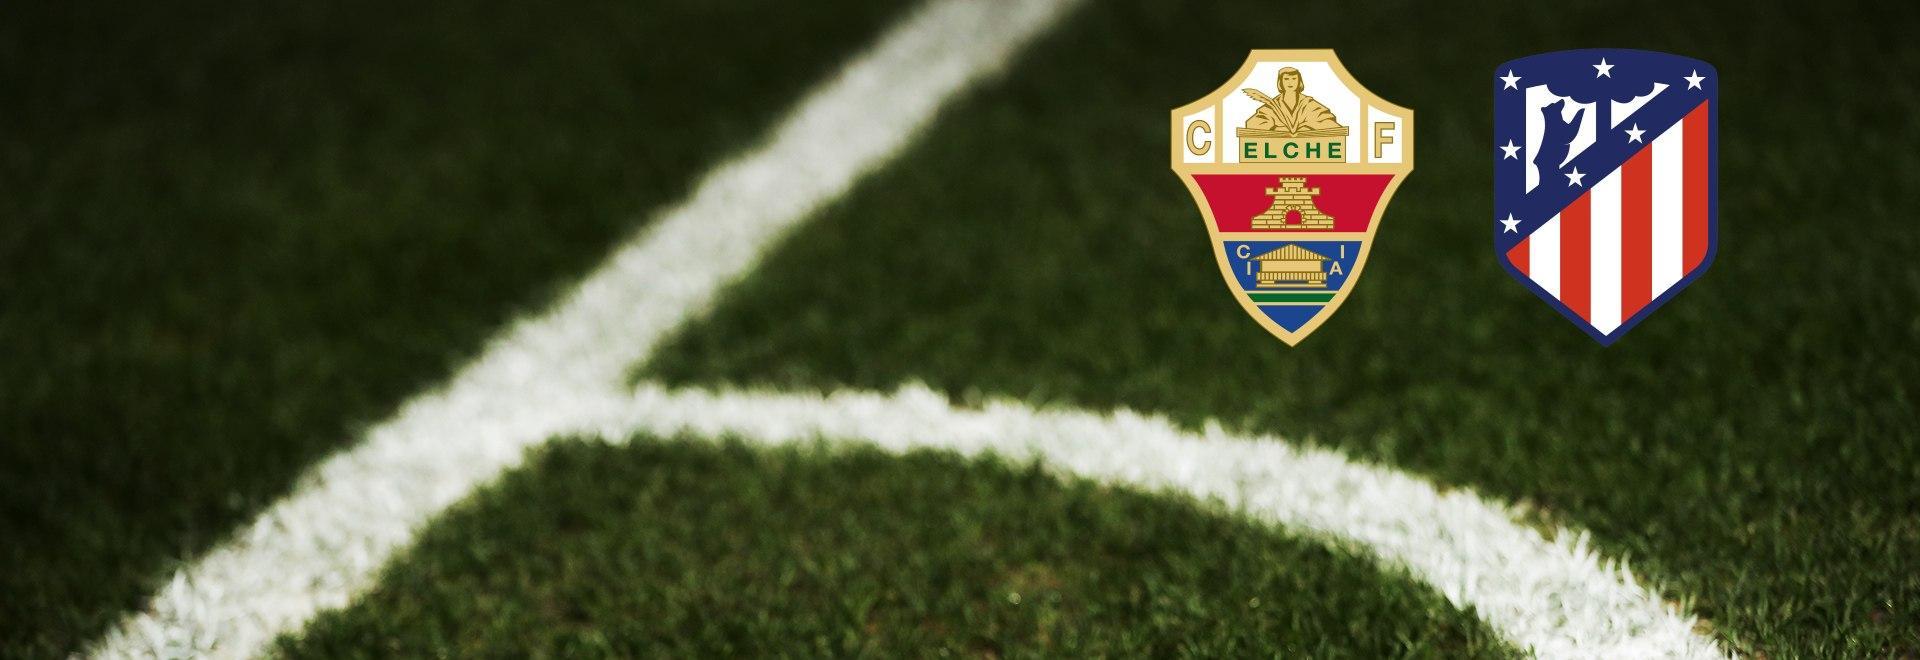 Elche - Atlético Madrid. 34a g.